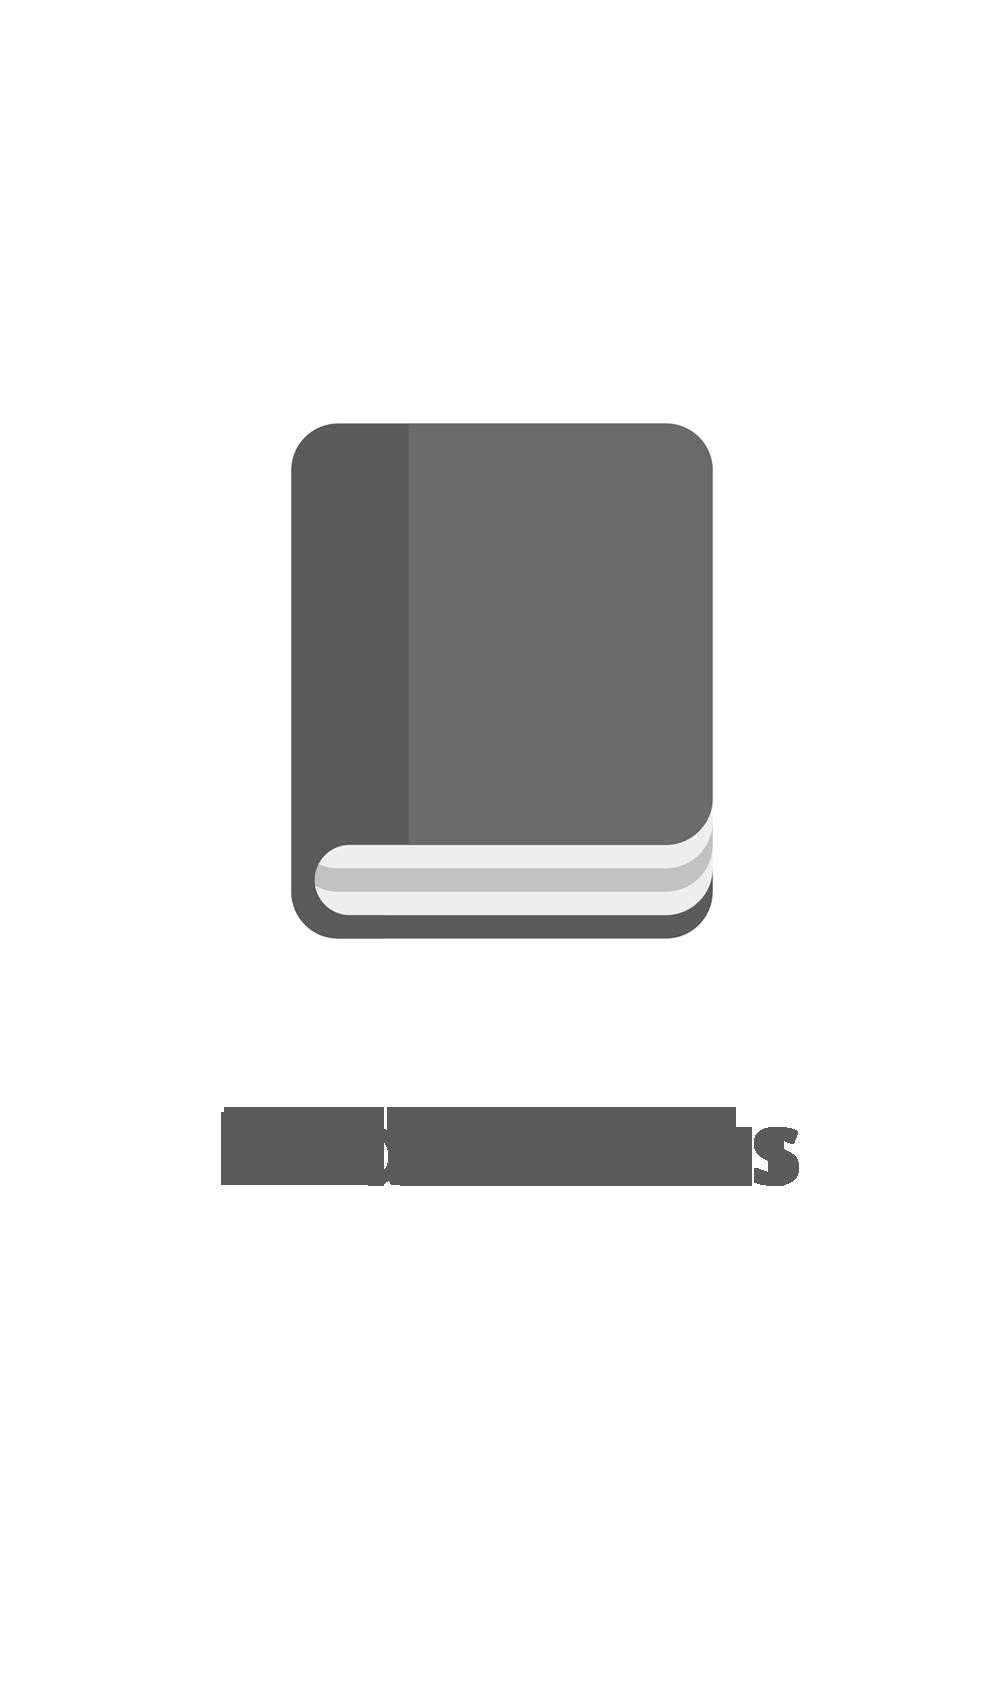 Mattis fågelbok